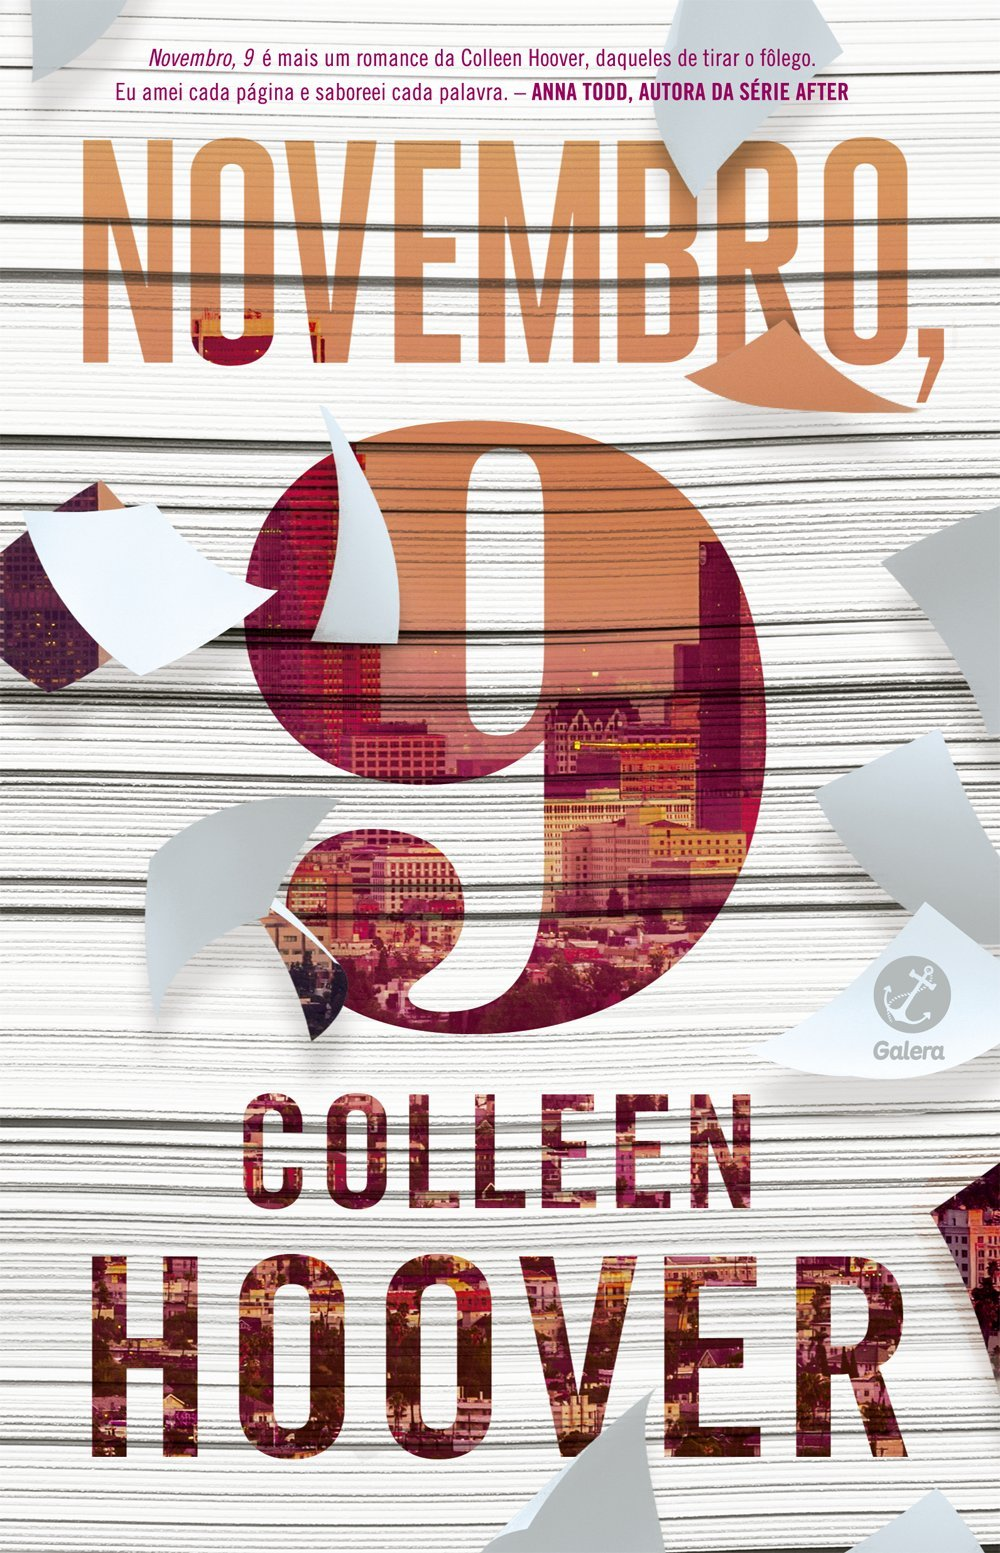 Resultado de imagem para novembro 9 colleen hoover capa